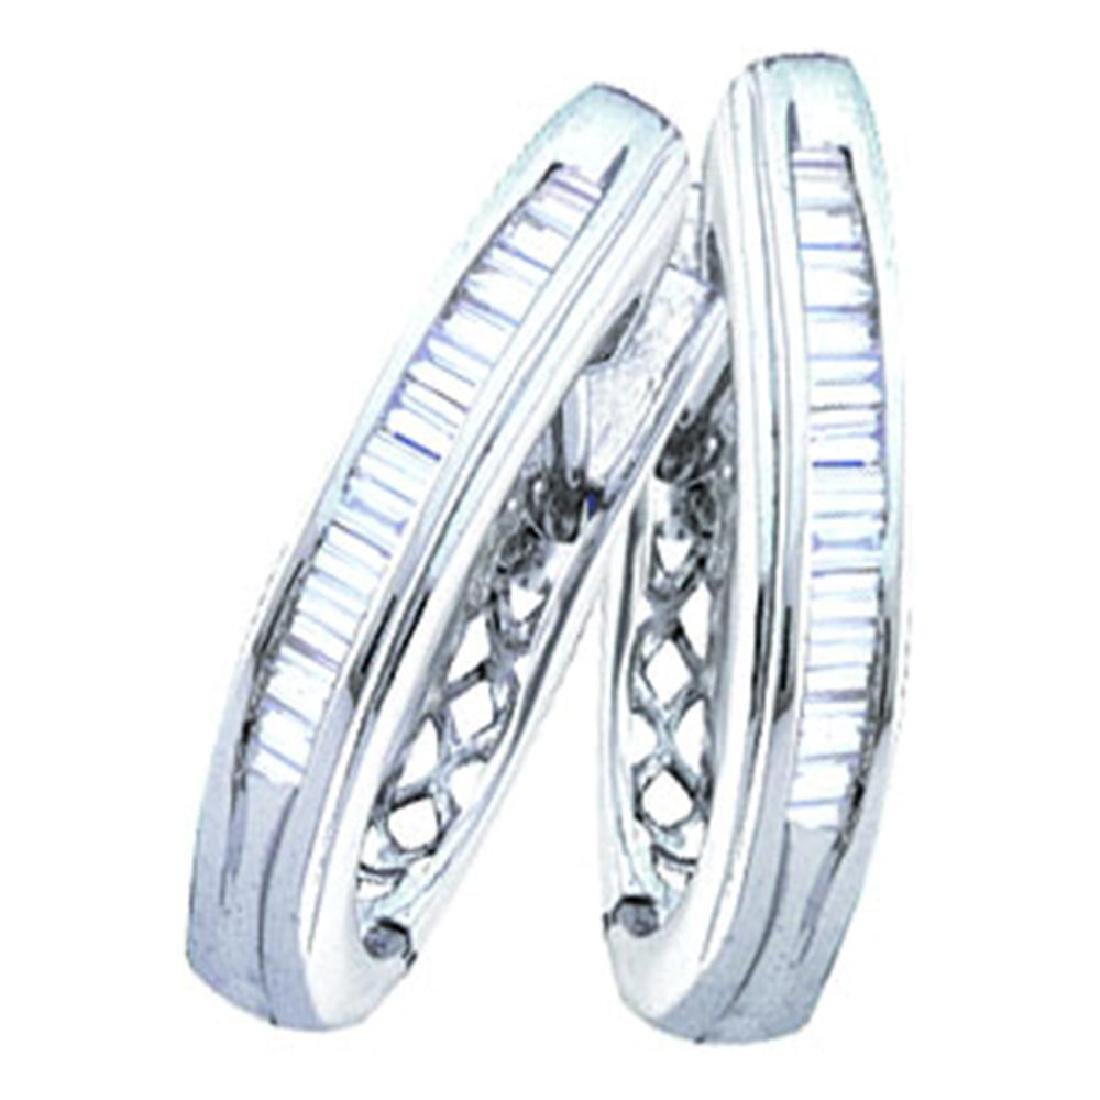 1 CTW Diamond Hoop Earrings 14KT White Gold - REF-64Y4X